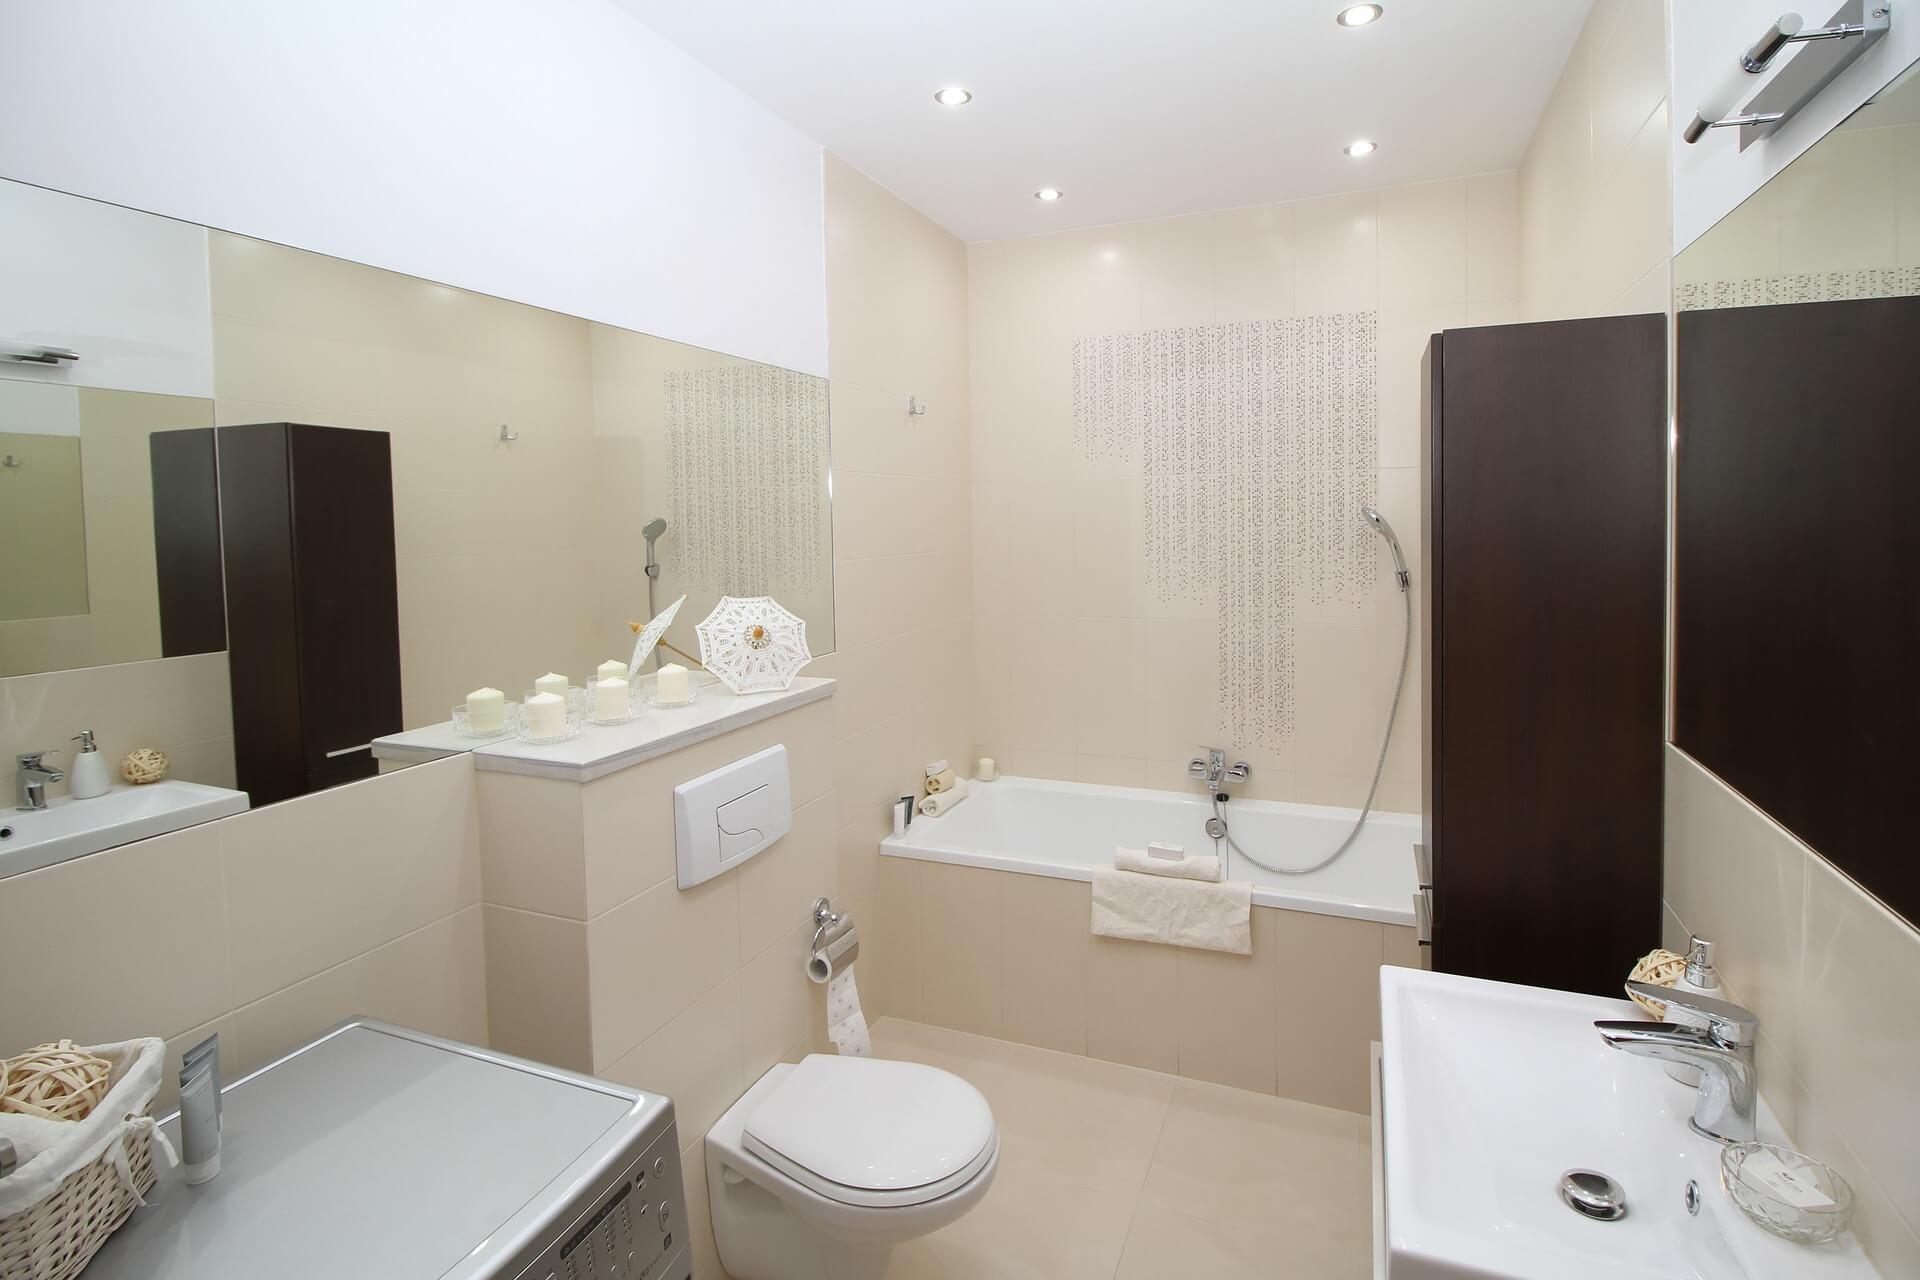 bathroom remodeling in Pennsylvania by McHale's KBA